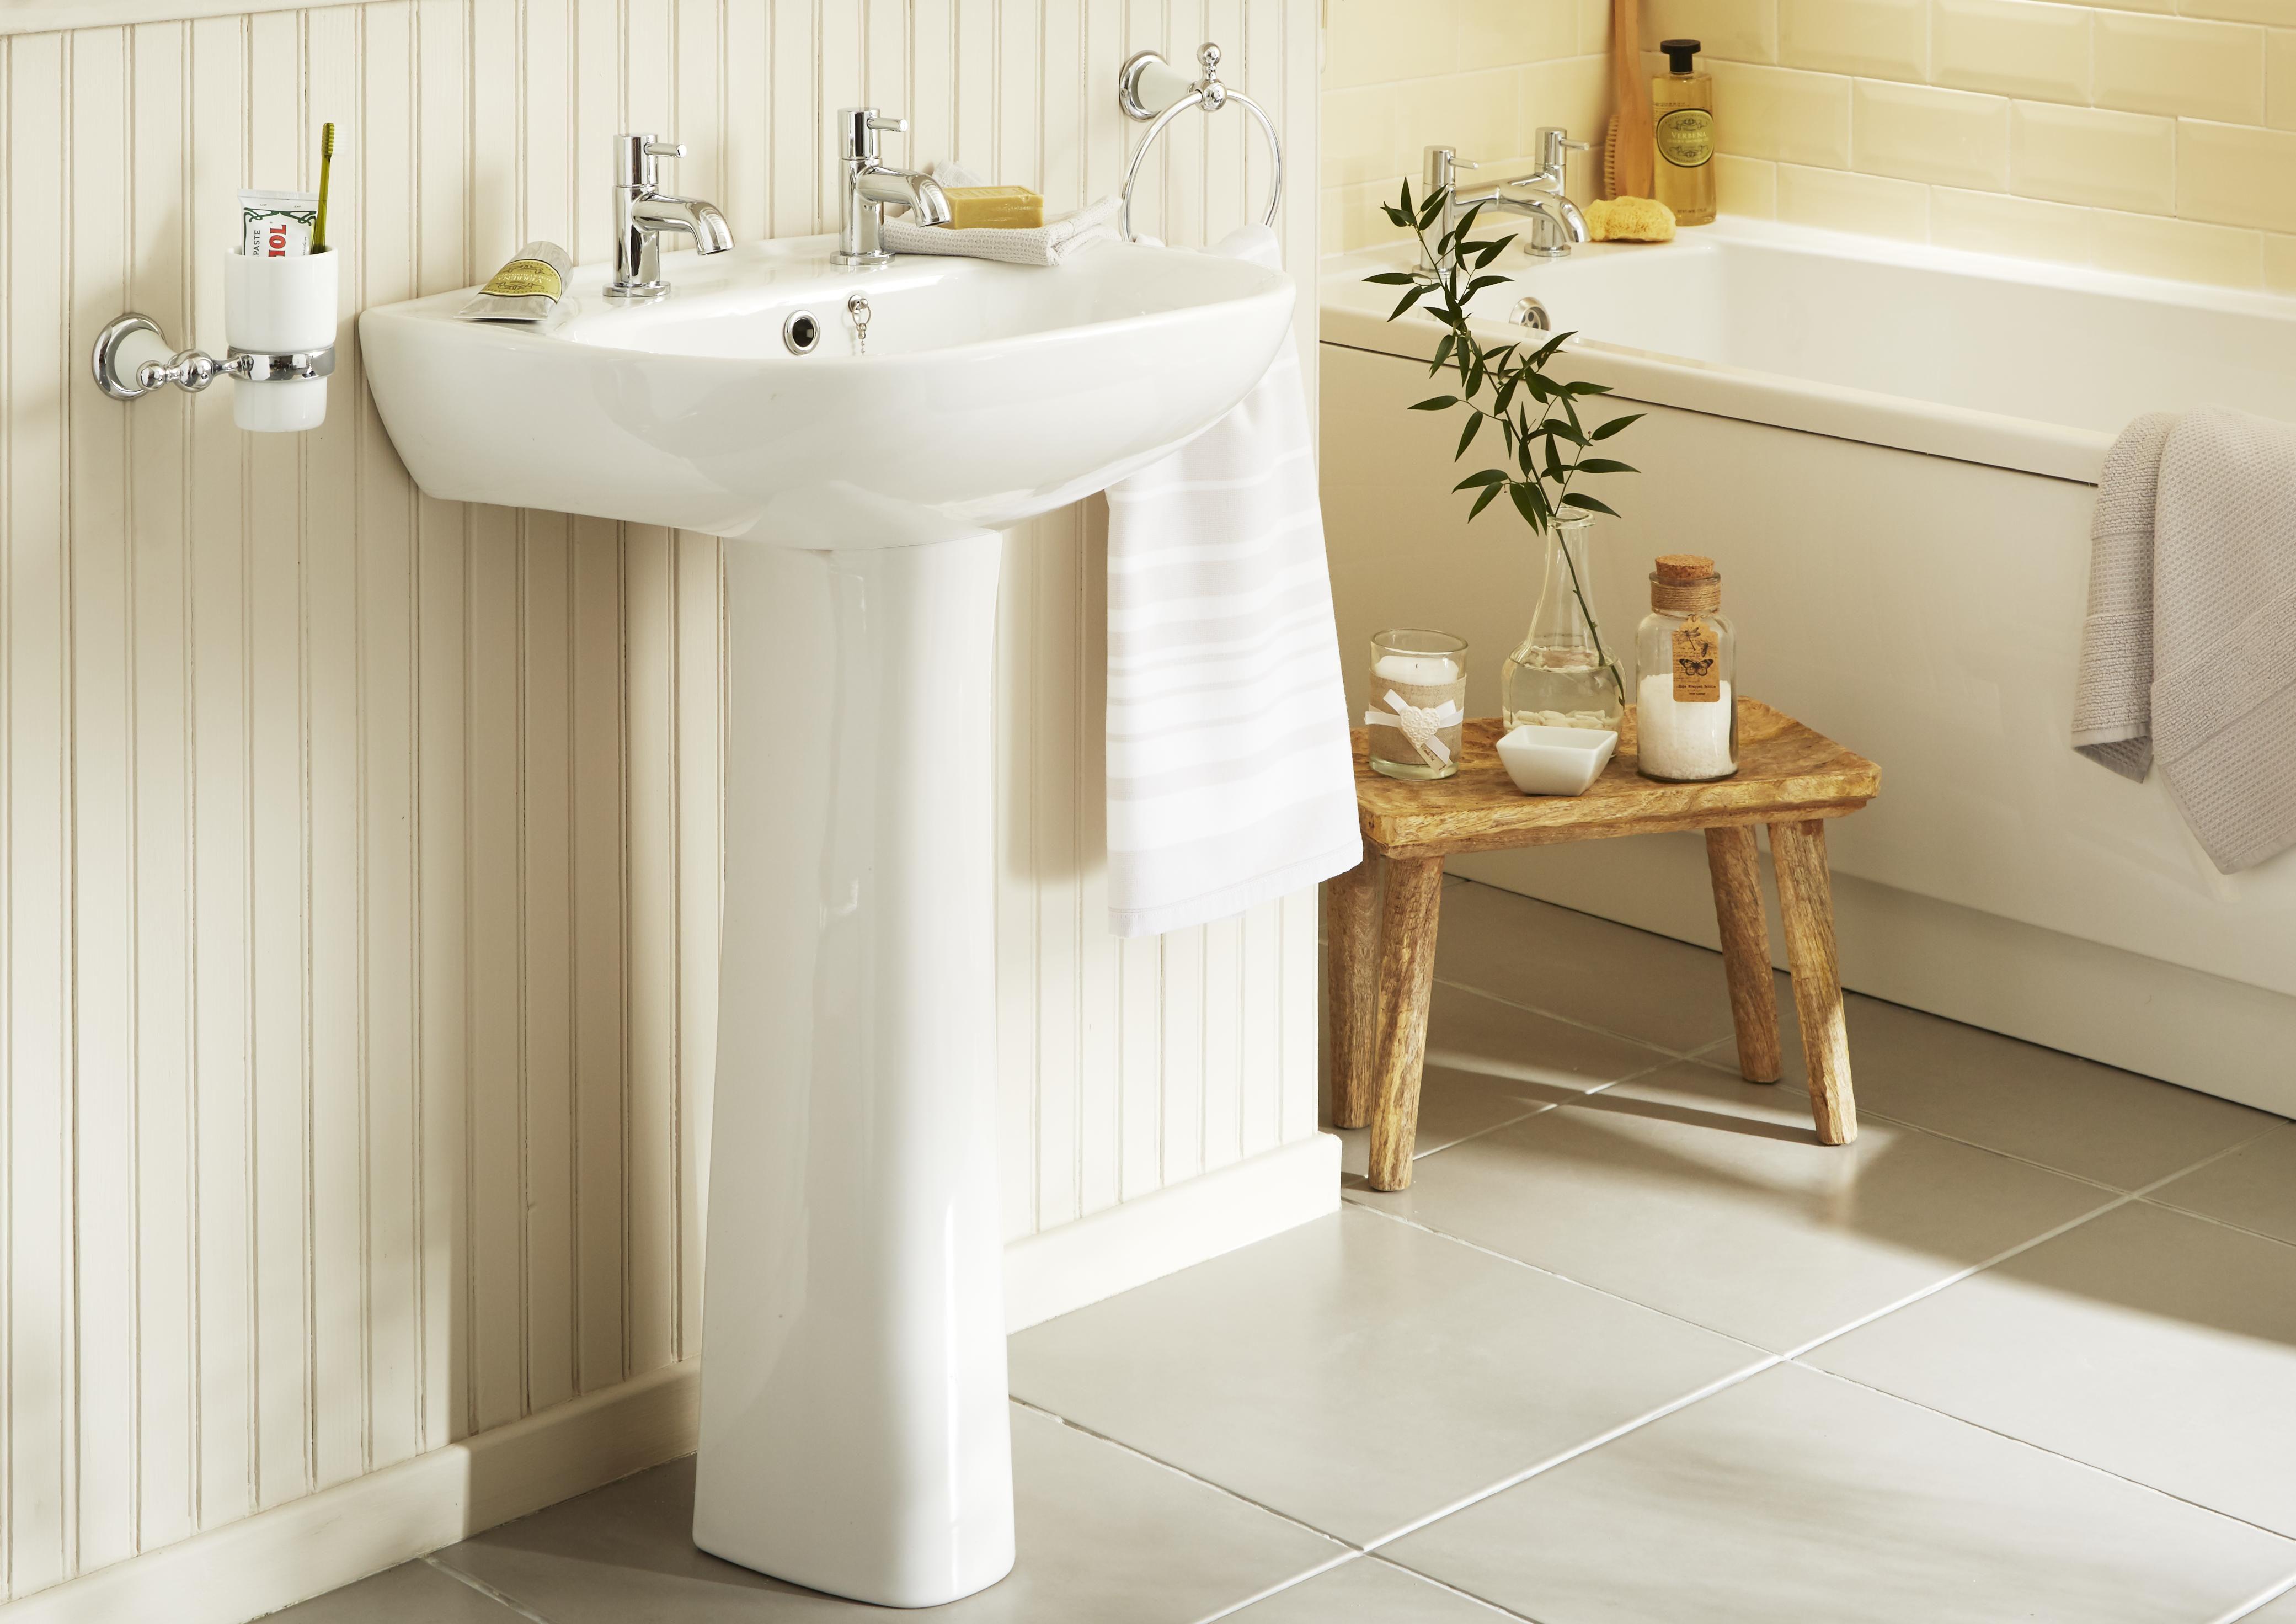 Bathroom Cabinets B And Q